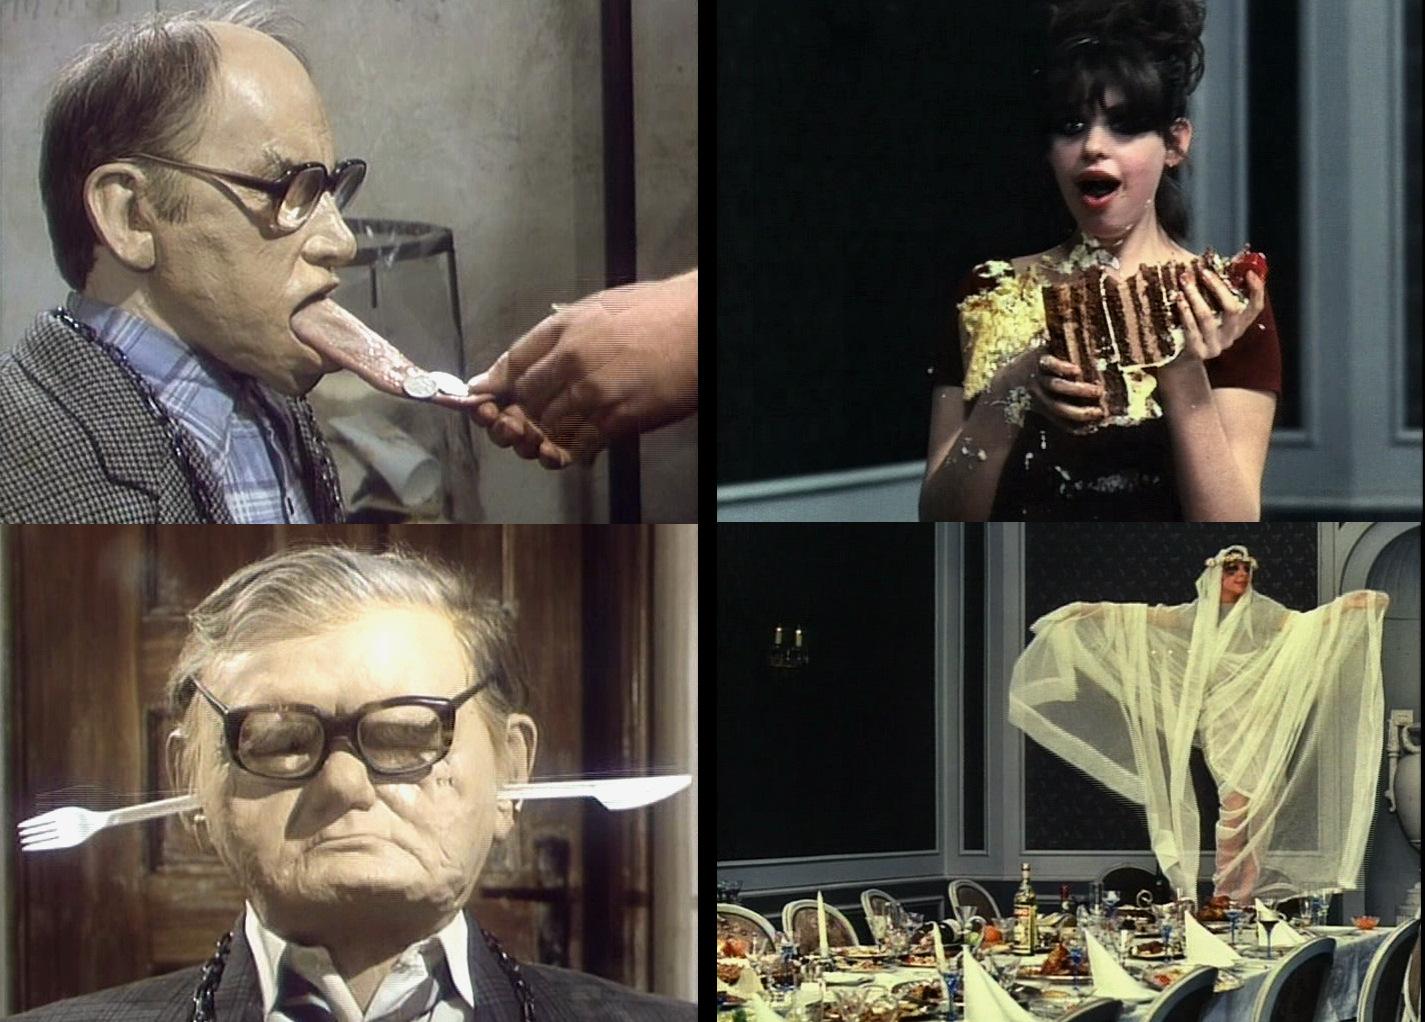 Image3 - بررسی و تحلیل انیمیشن کوتاه Food 1993 اثر یان شوانکمایر